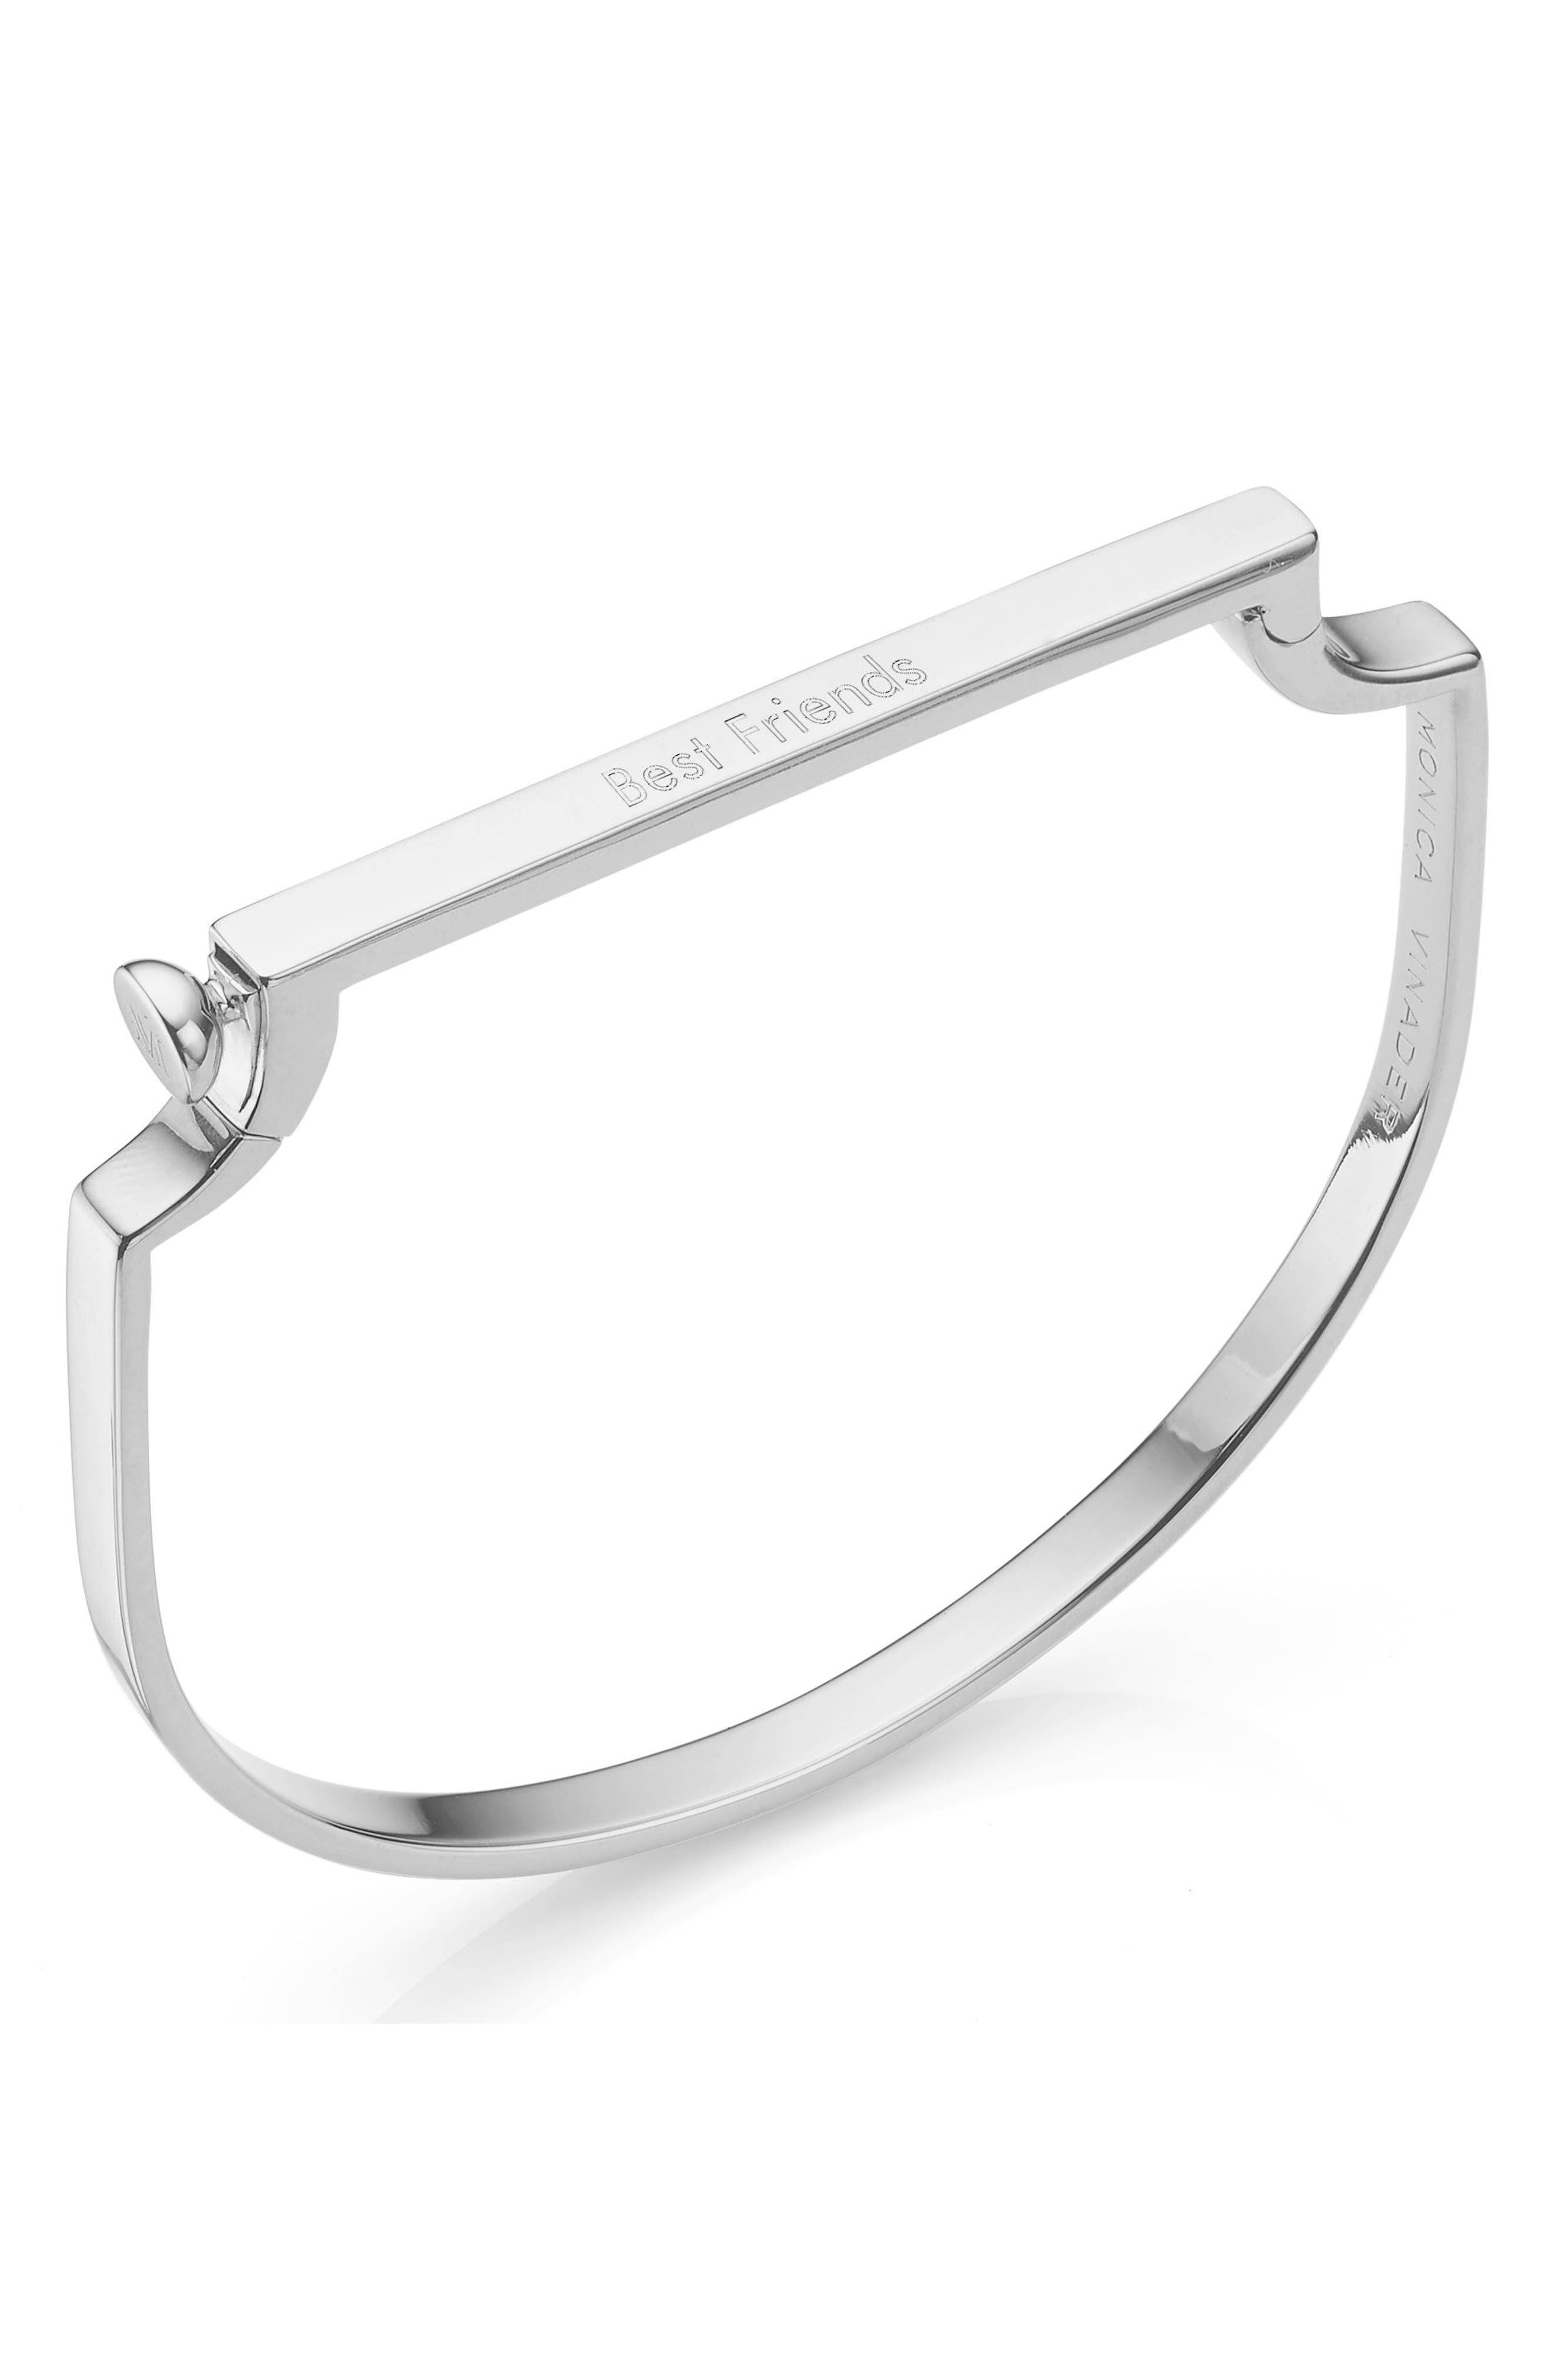 MONICA VINADER, Engravable Signature Thin Bangle Bracelet, Alternate thumbnail 4, color, SILVER